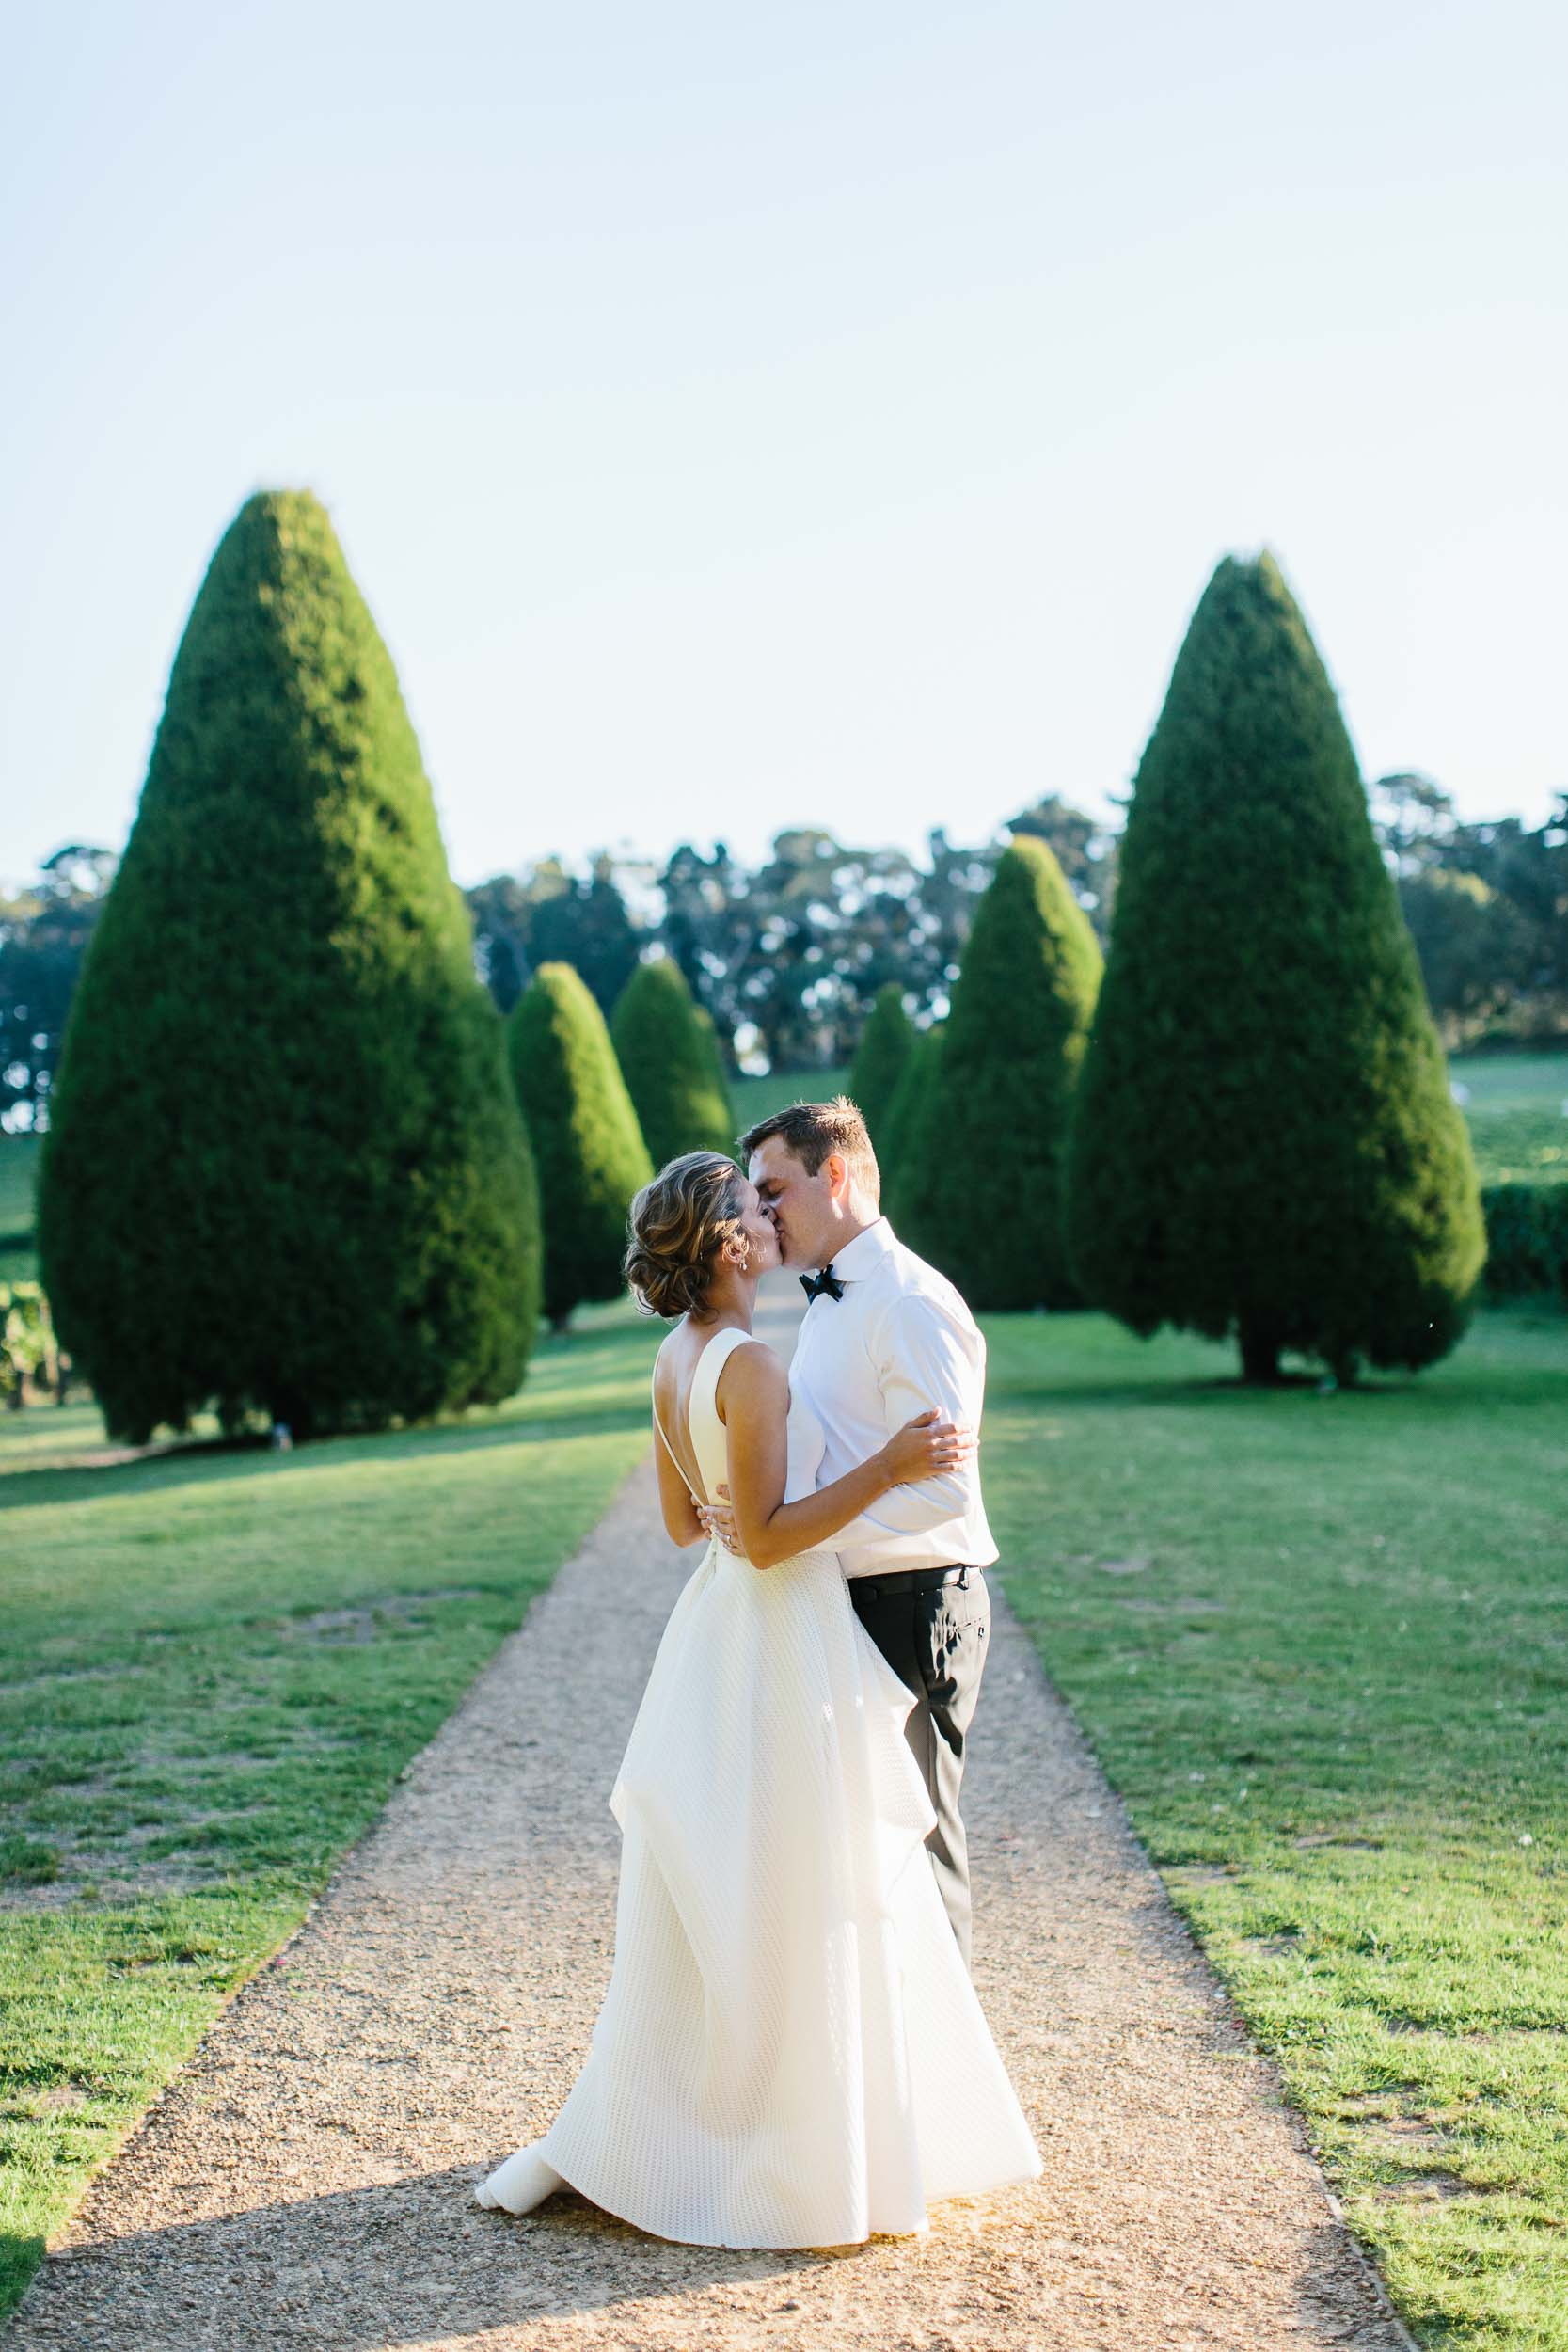 Kas-Richards-Mornington-Peninsula-Wedding-Lindenderry-Red-Hill-575.jpg